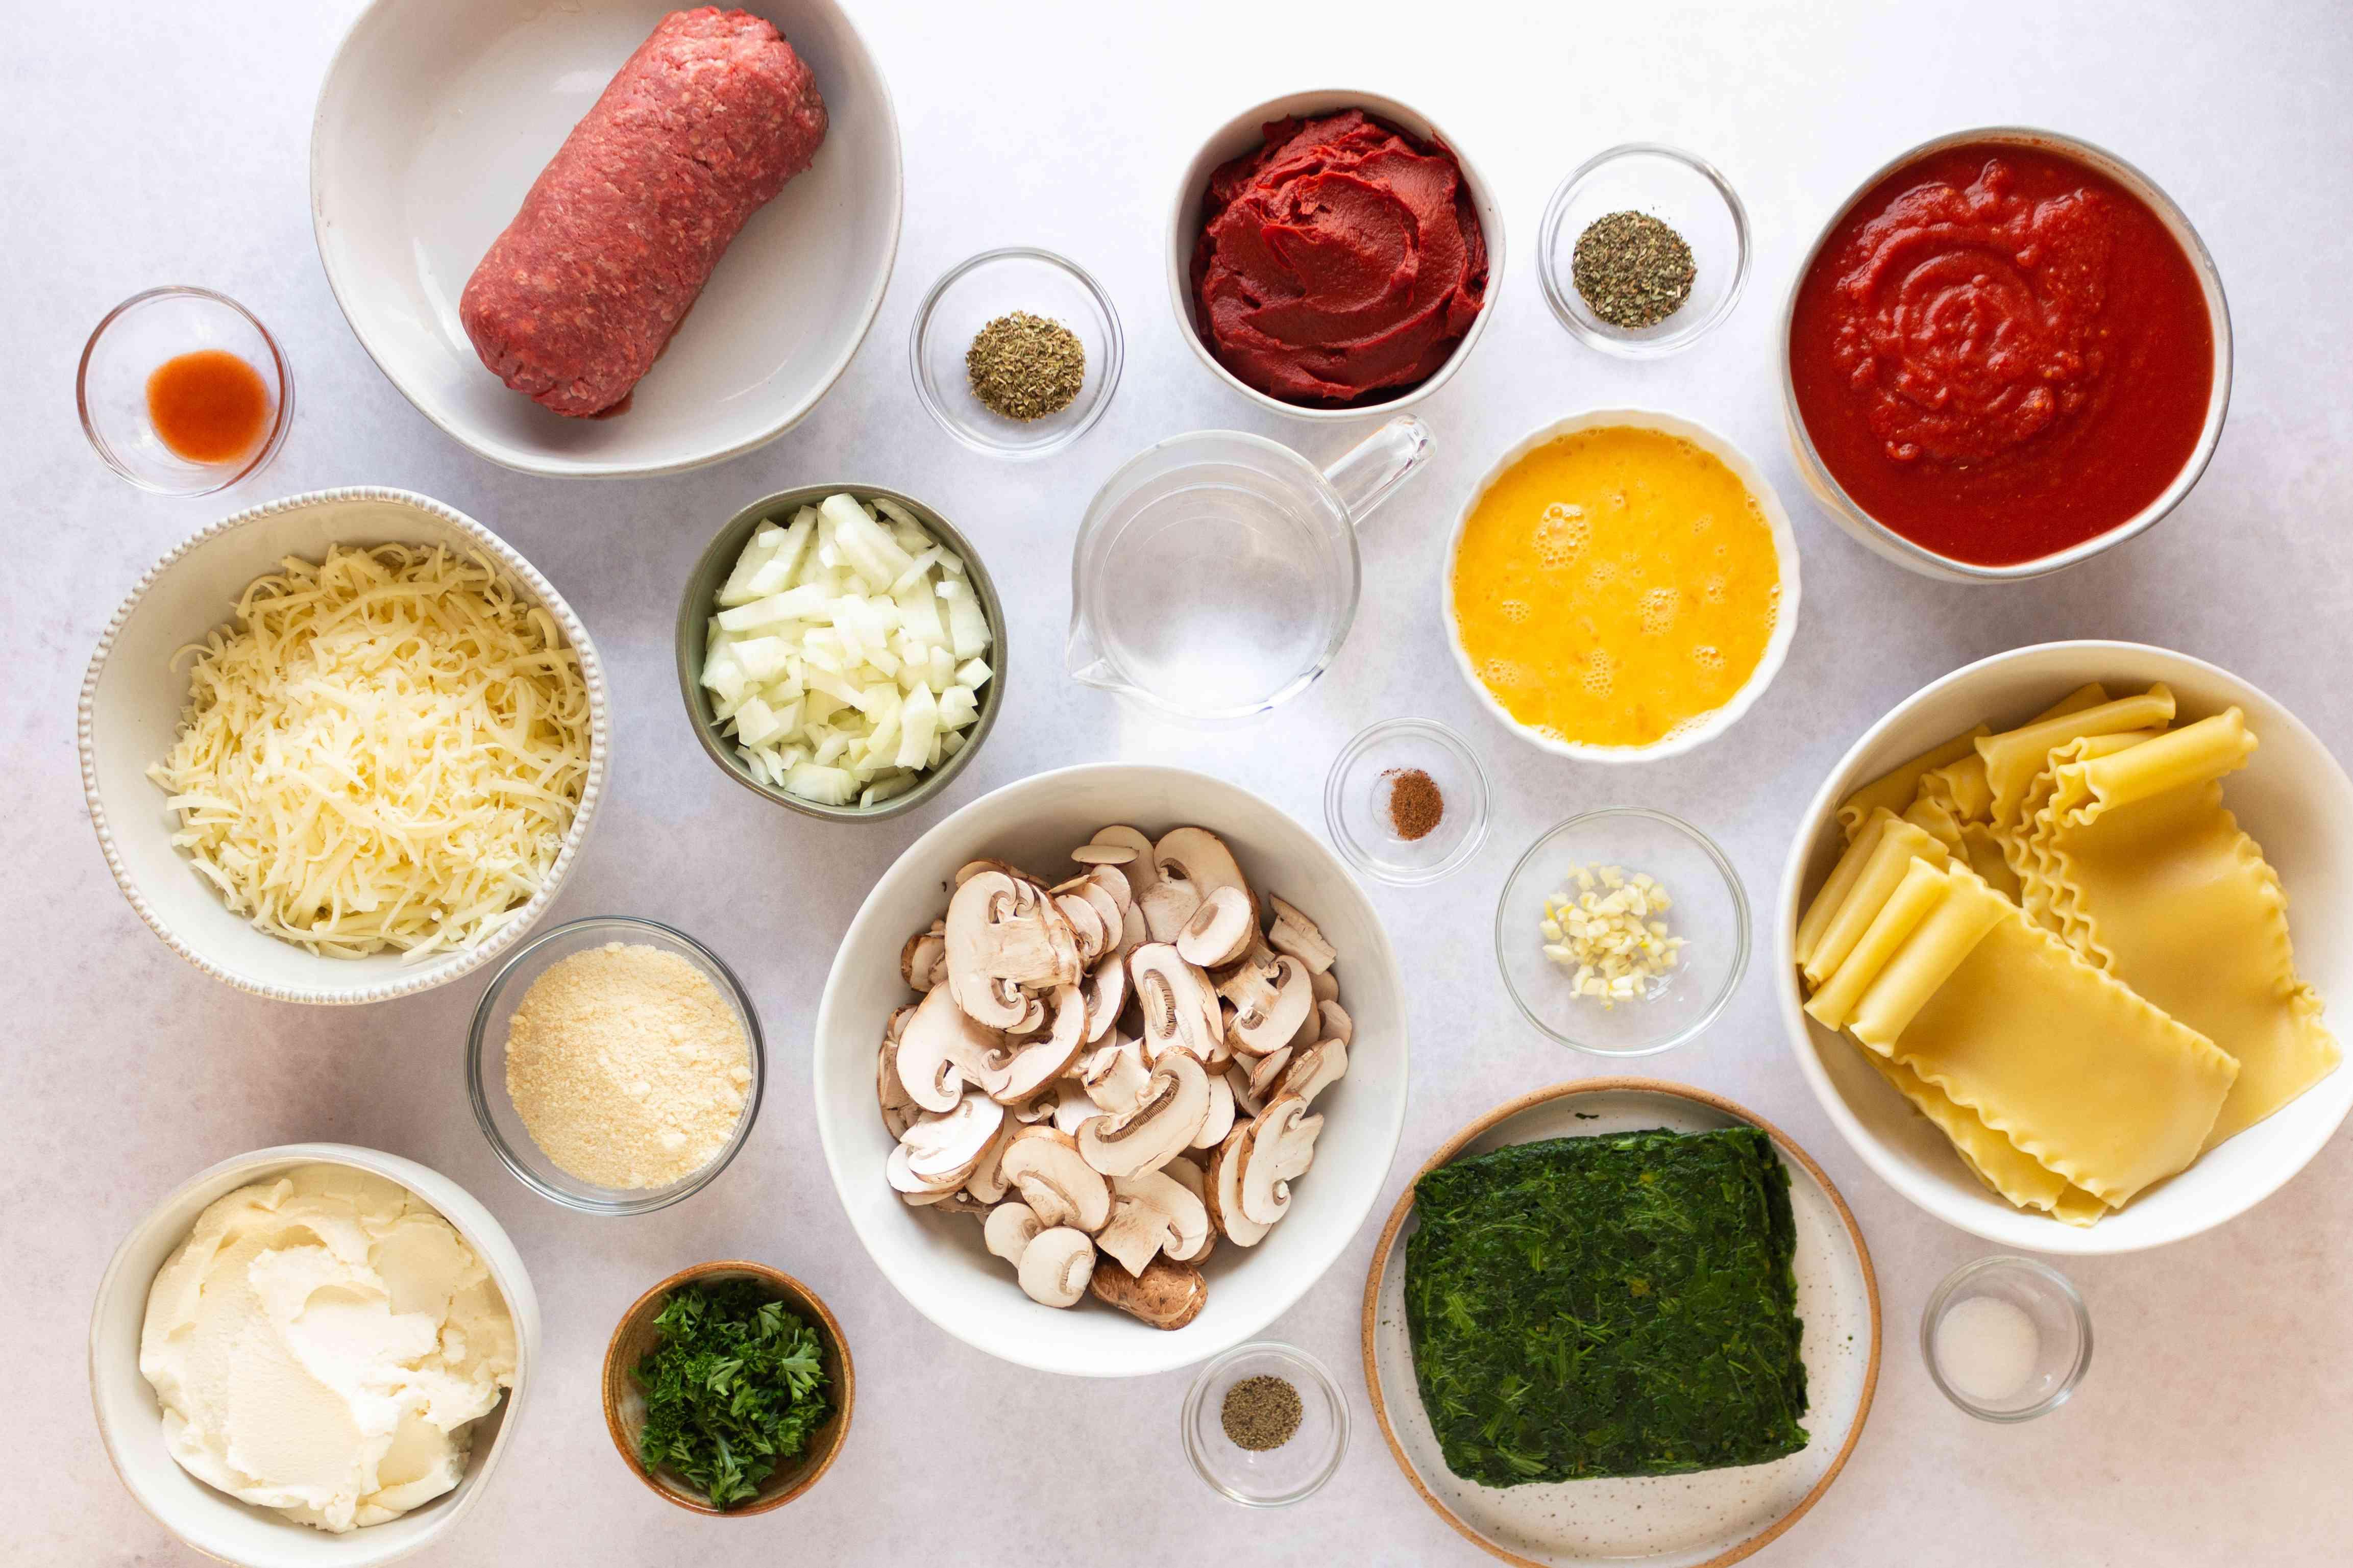 Spinach Lasagna Roll-Ups ingredients